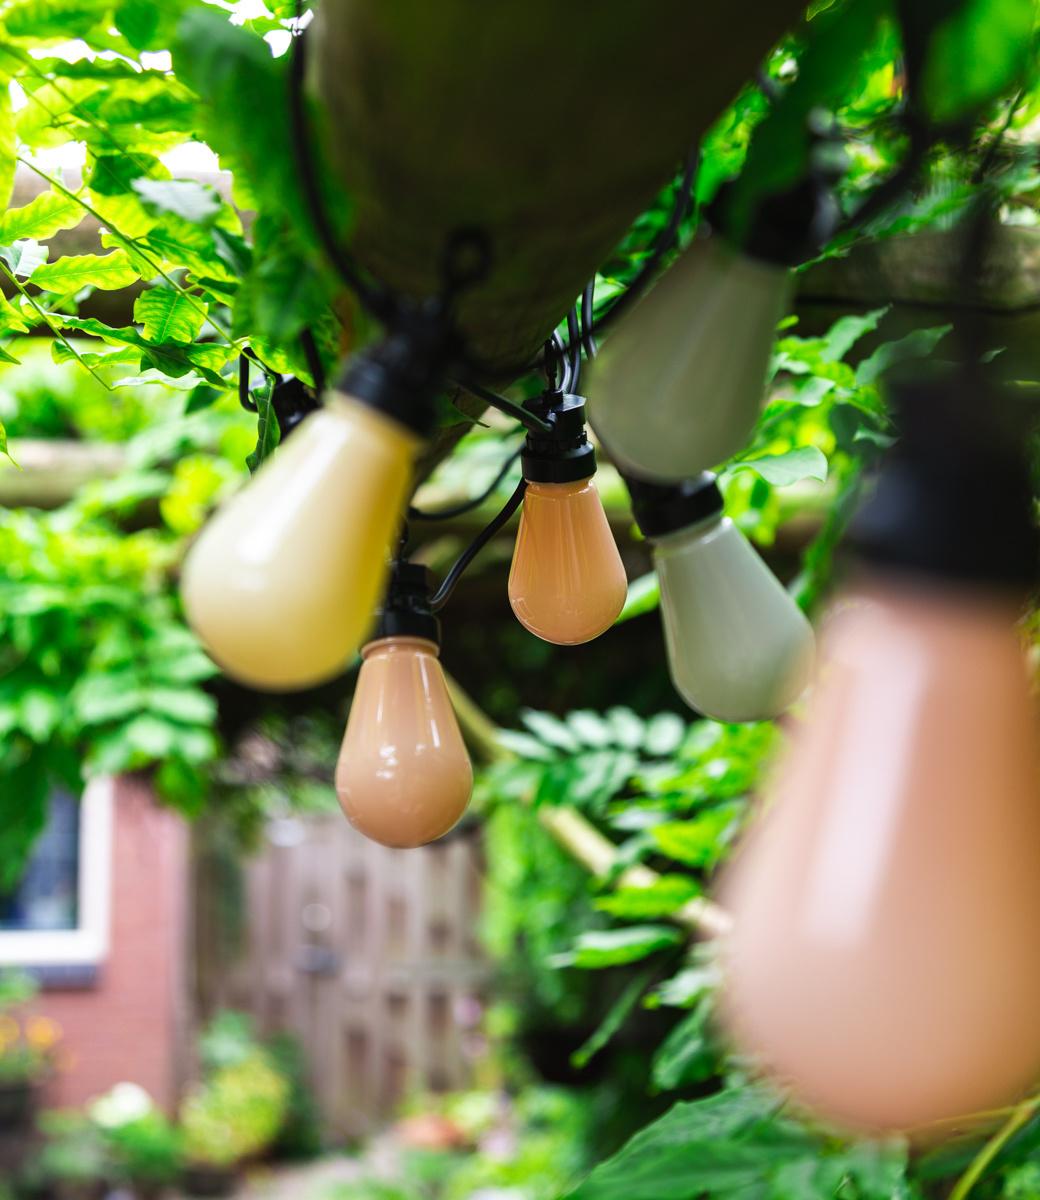 LEDR buiten feestverlichting groen en roze - Outdoor Patio Lichtslinger Paradise - 10 LED lampen - Edison Bulbs-3